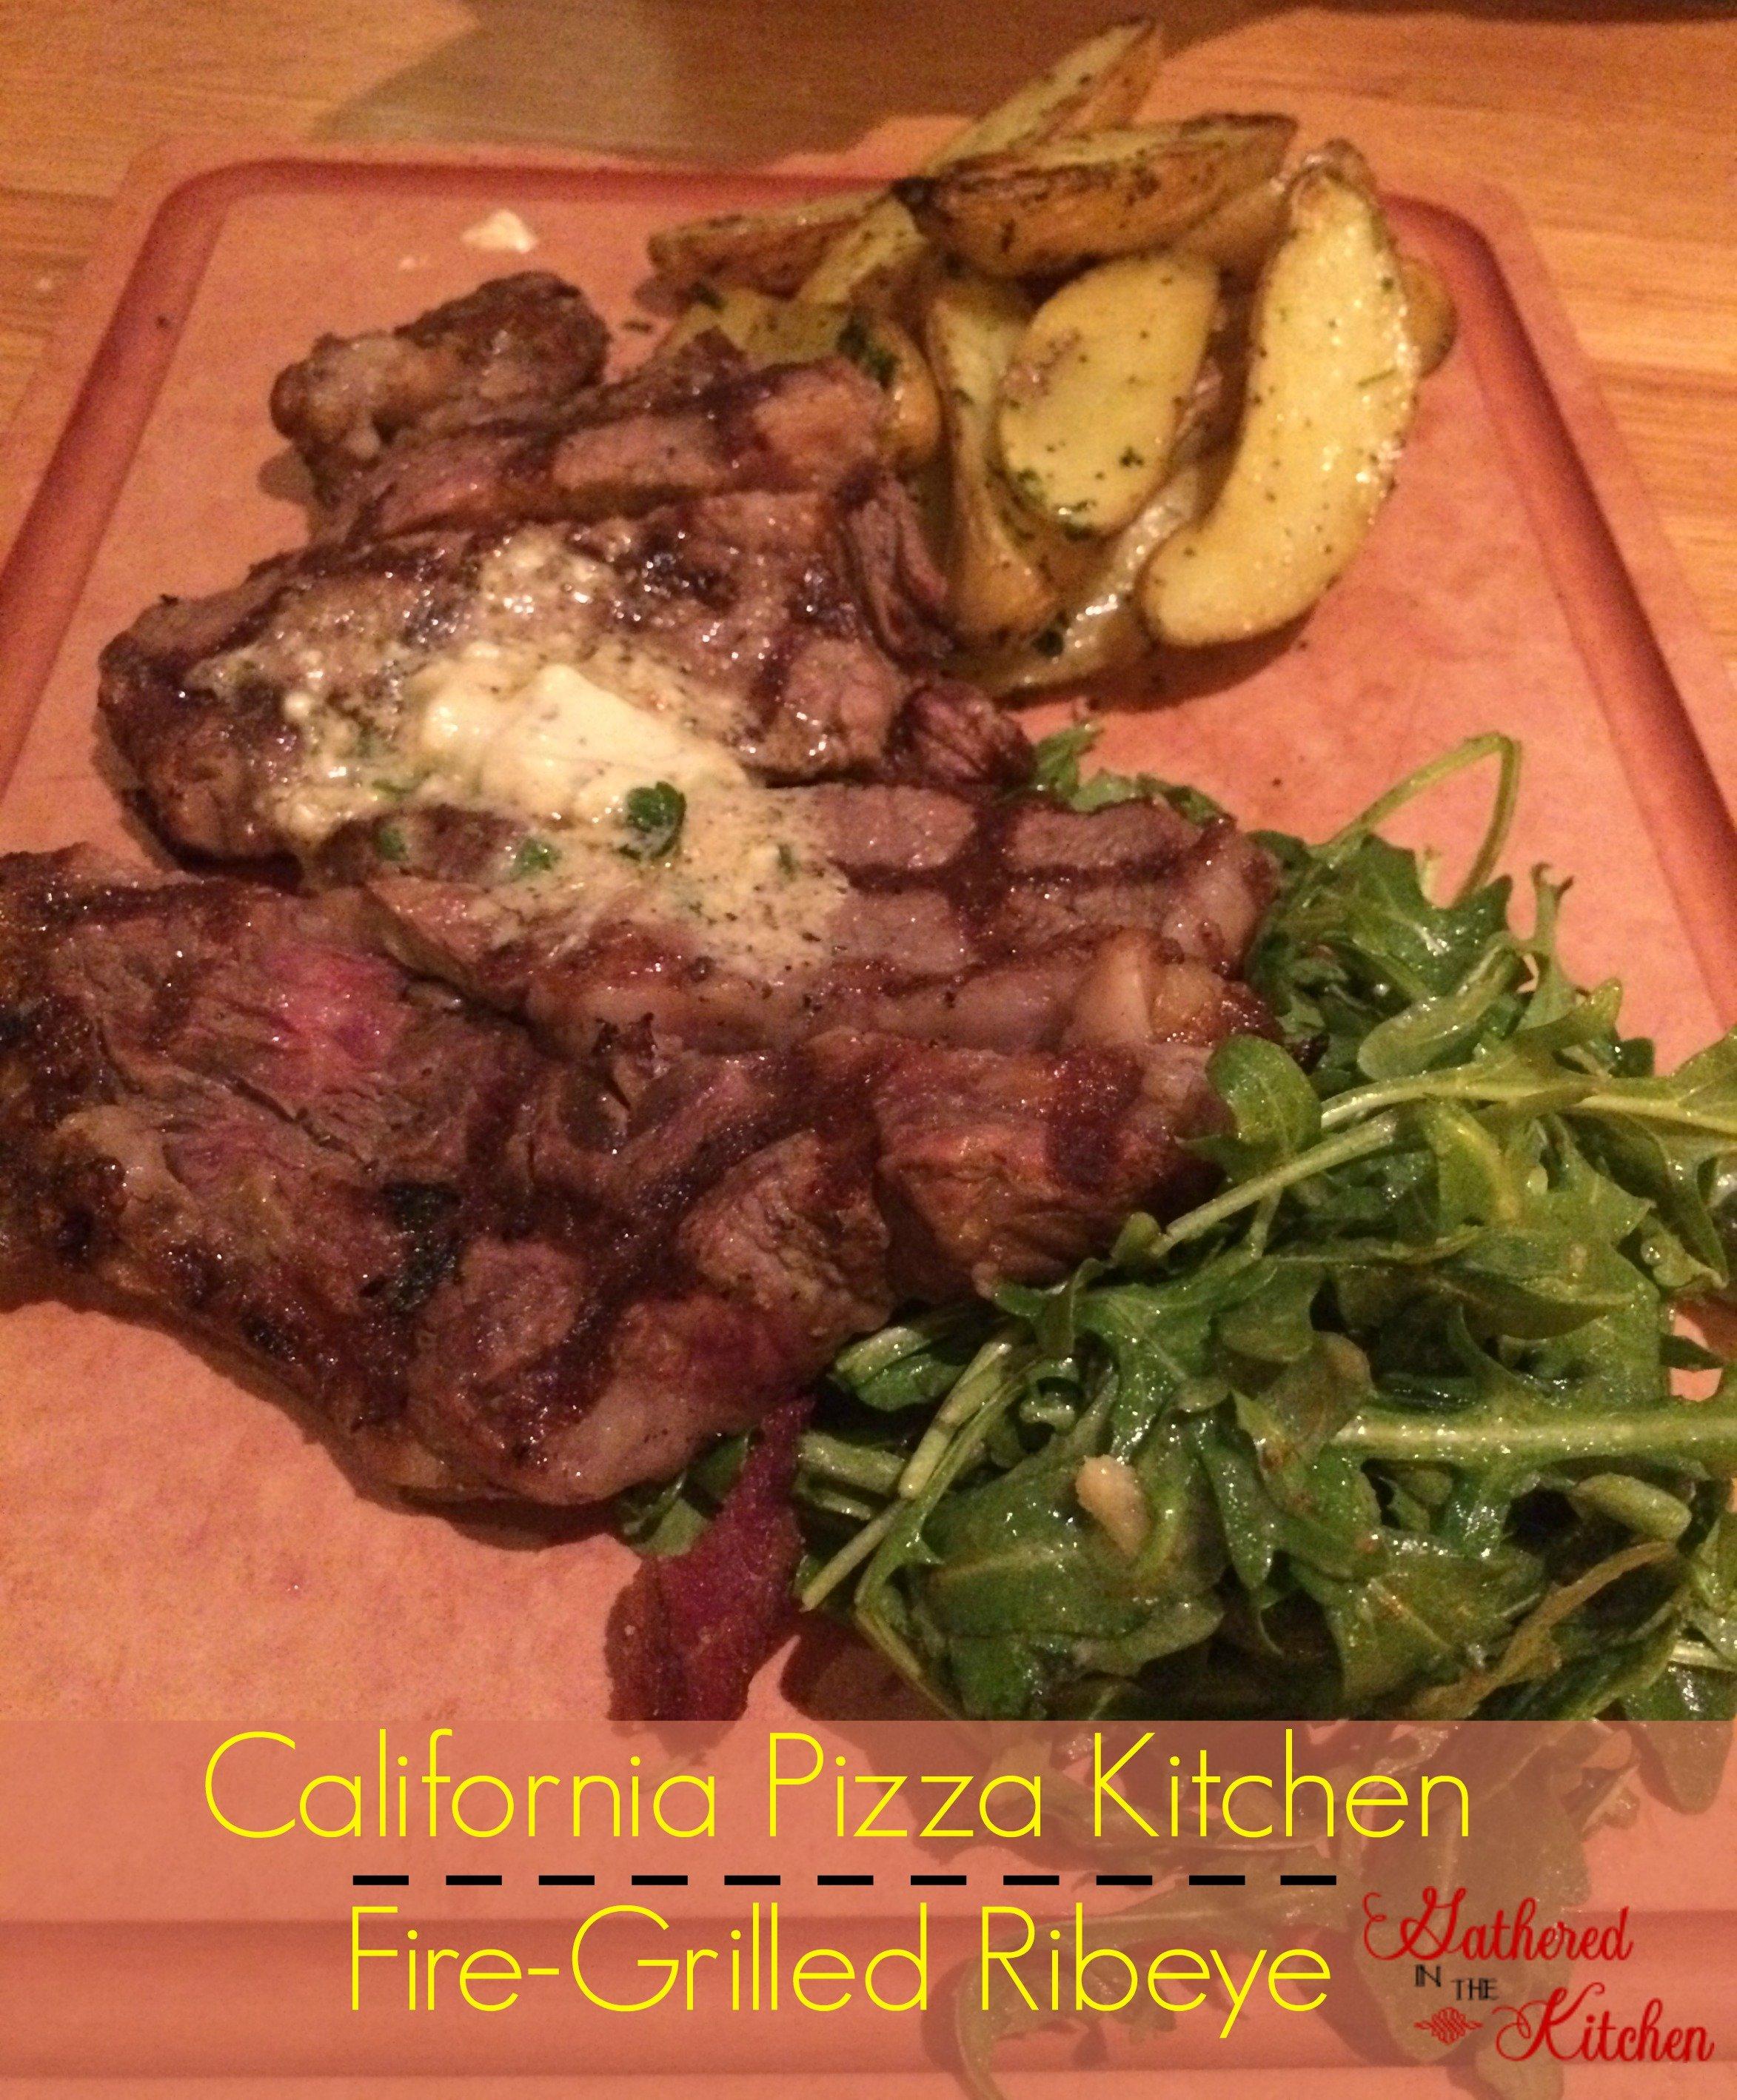 california pizza kitchen fire-grilled ribeye